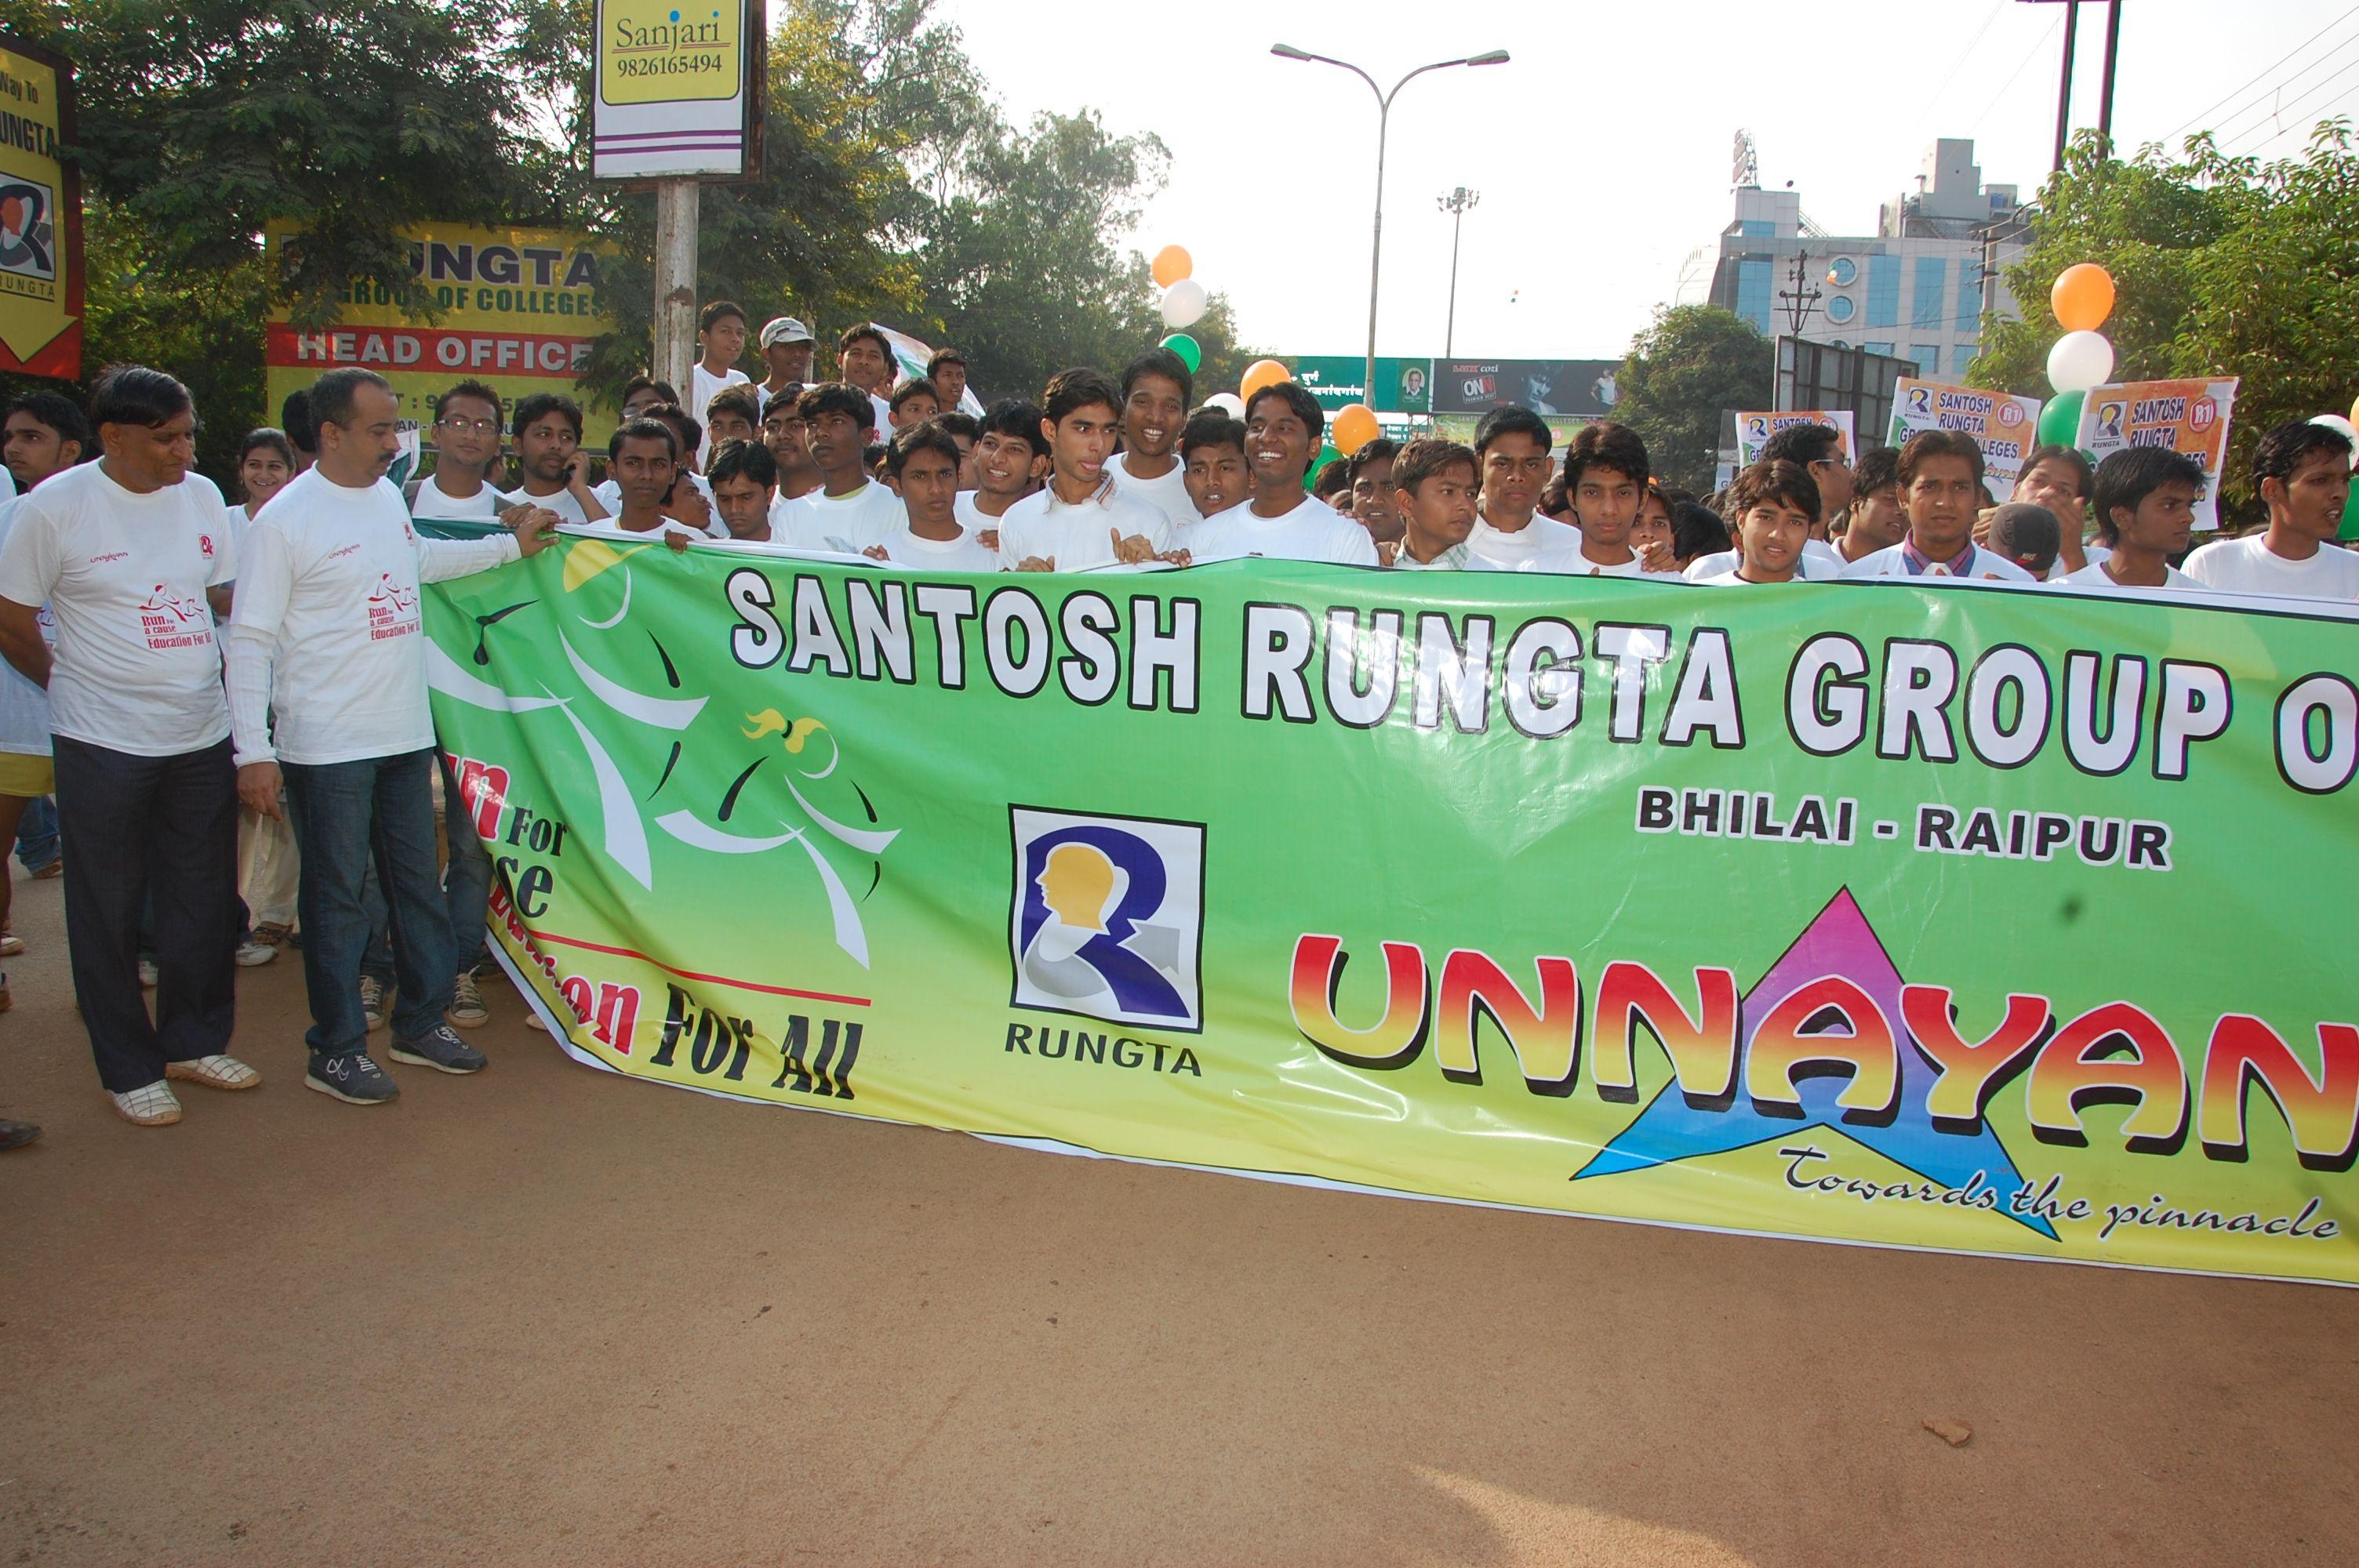 Kshitij - Unnayan 2010